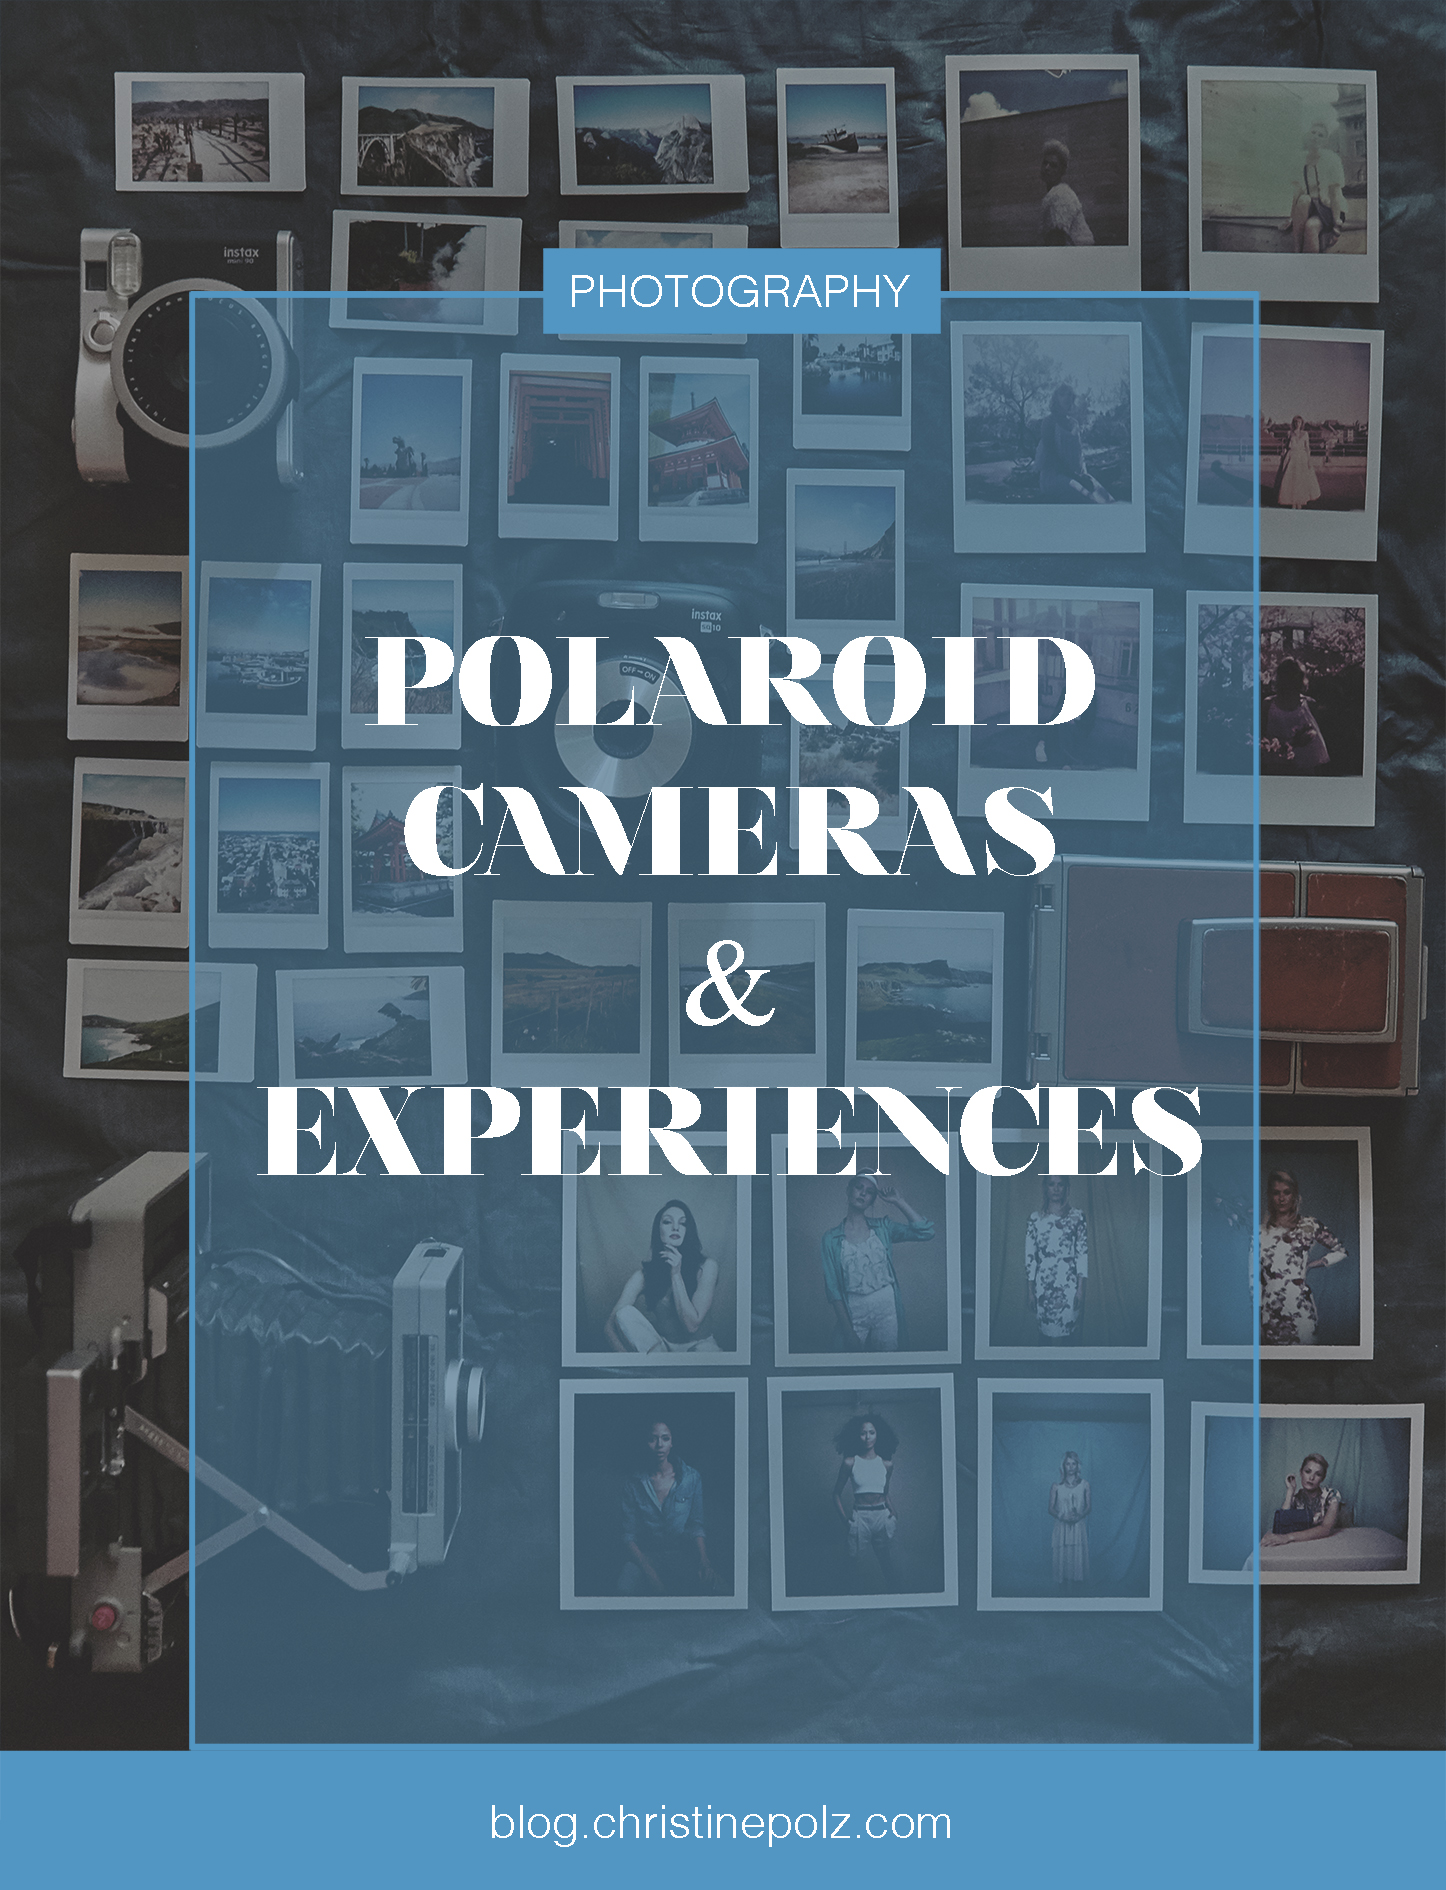 Polaroid Cameras & Experiences